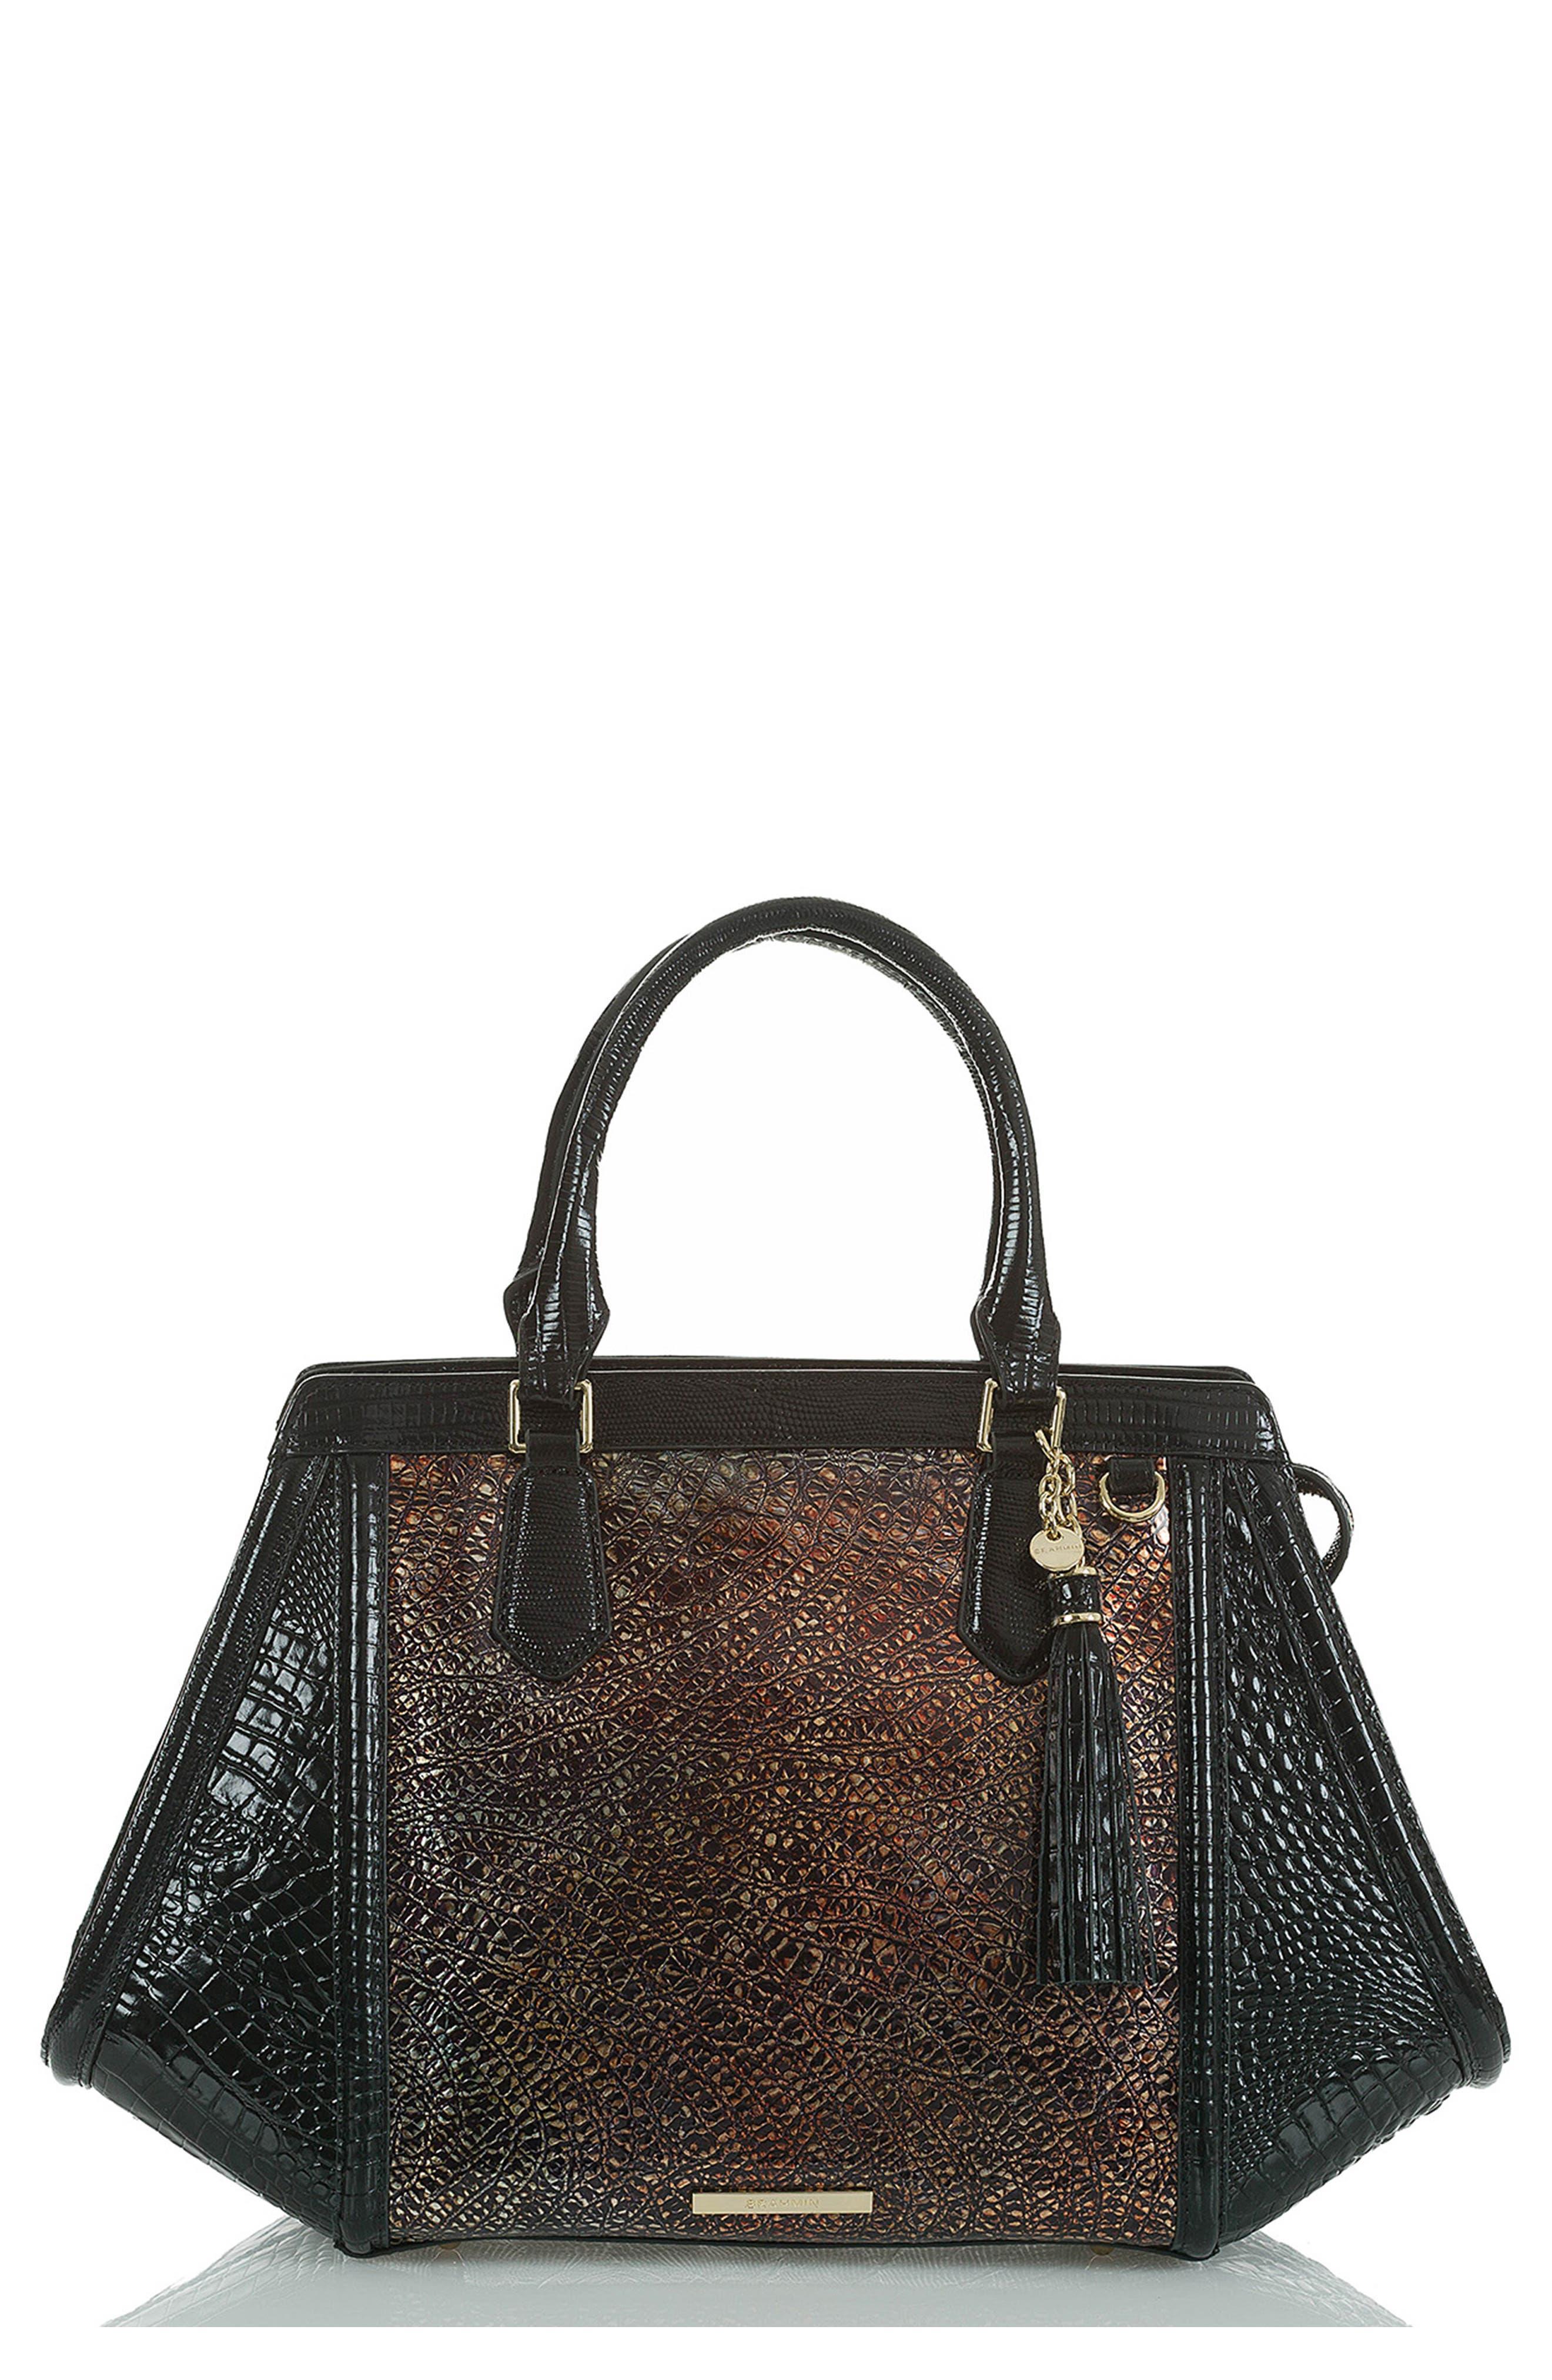 BRAHMIN Arden Embossed Leather Satchel, Main, color, MULTI